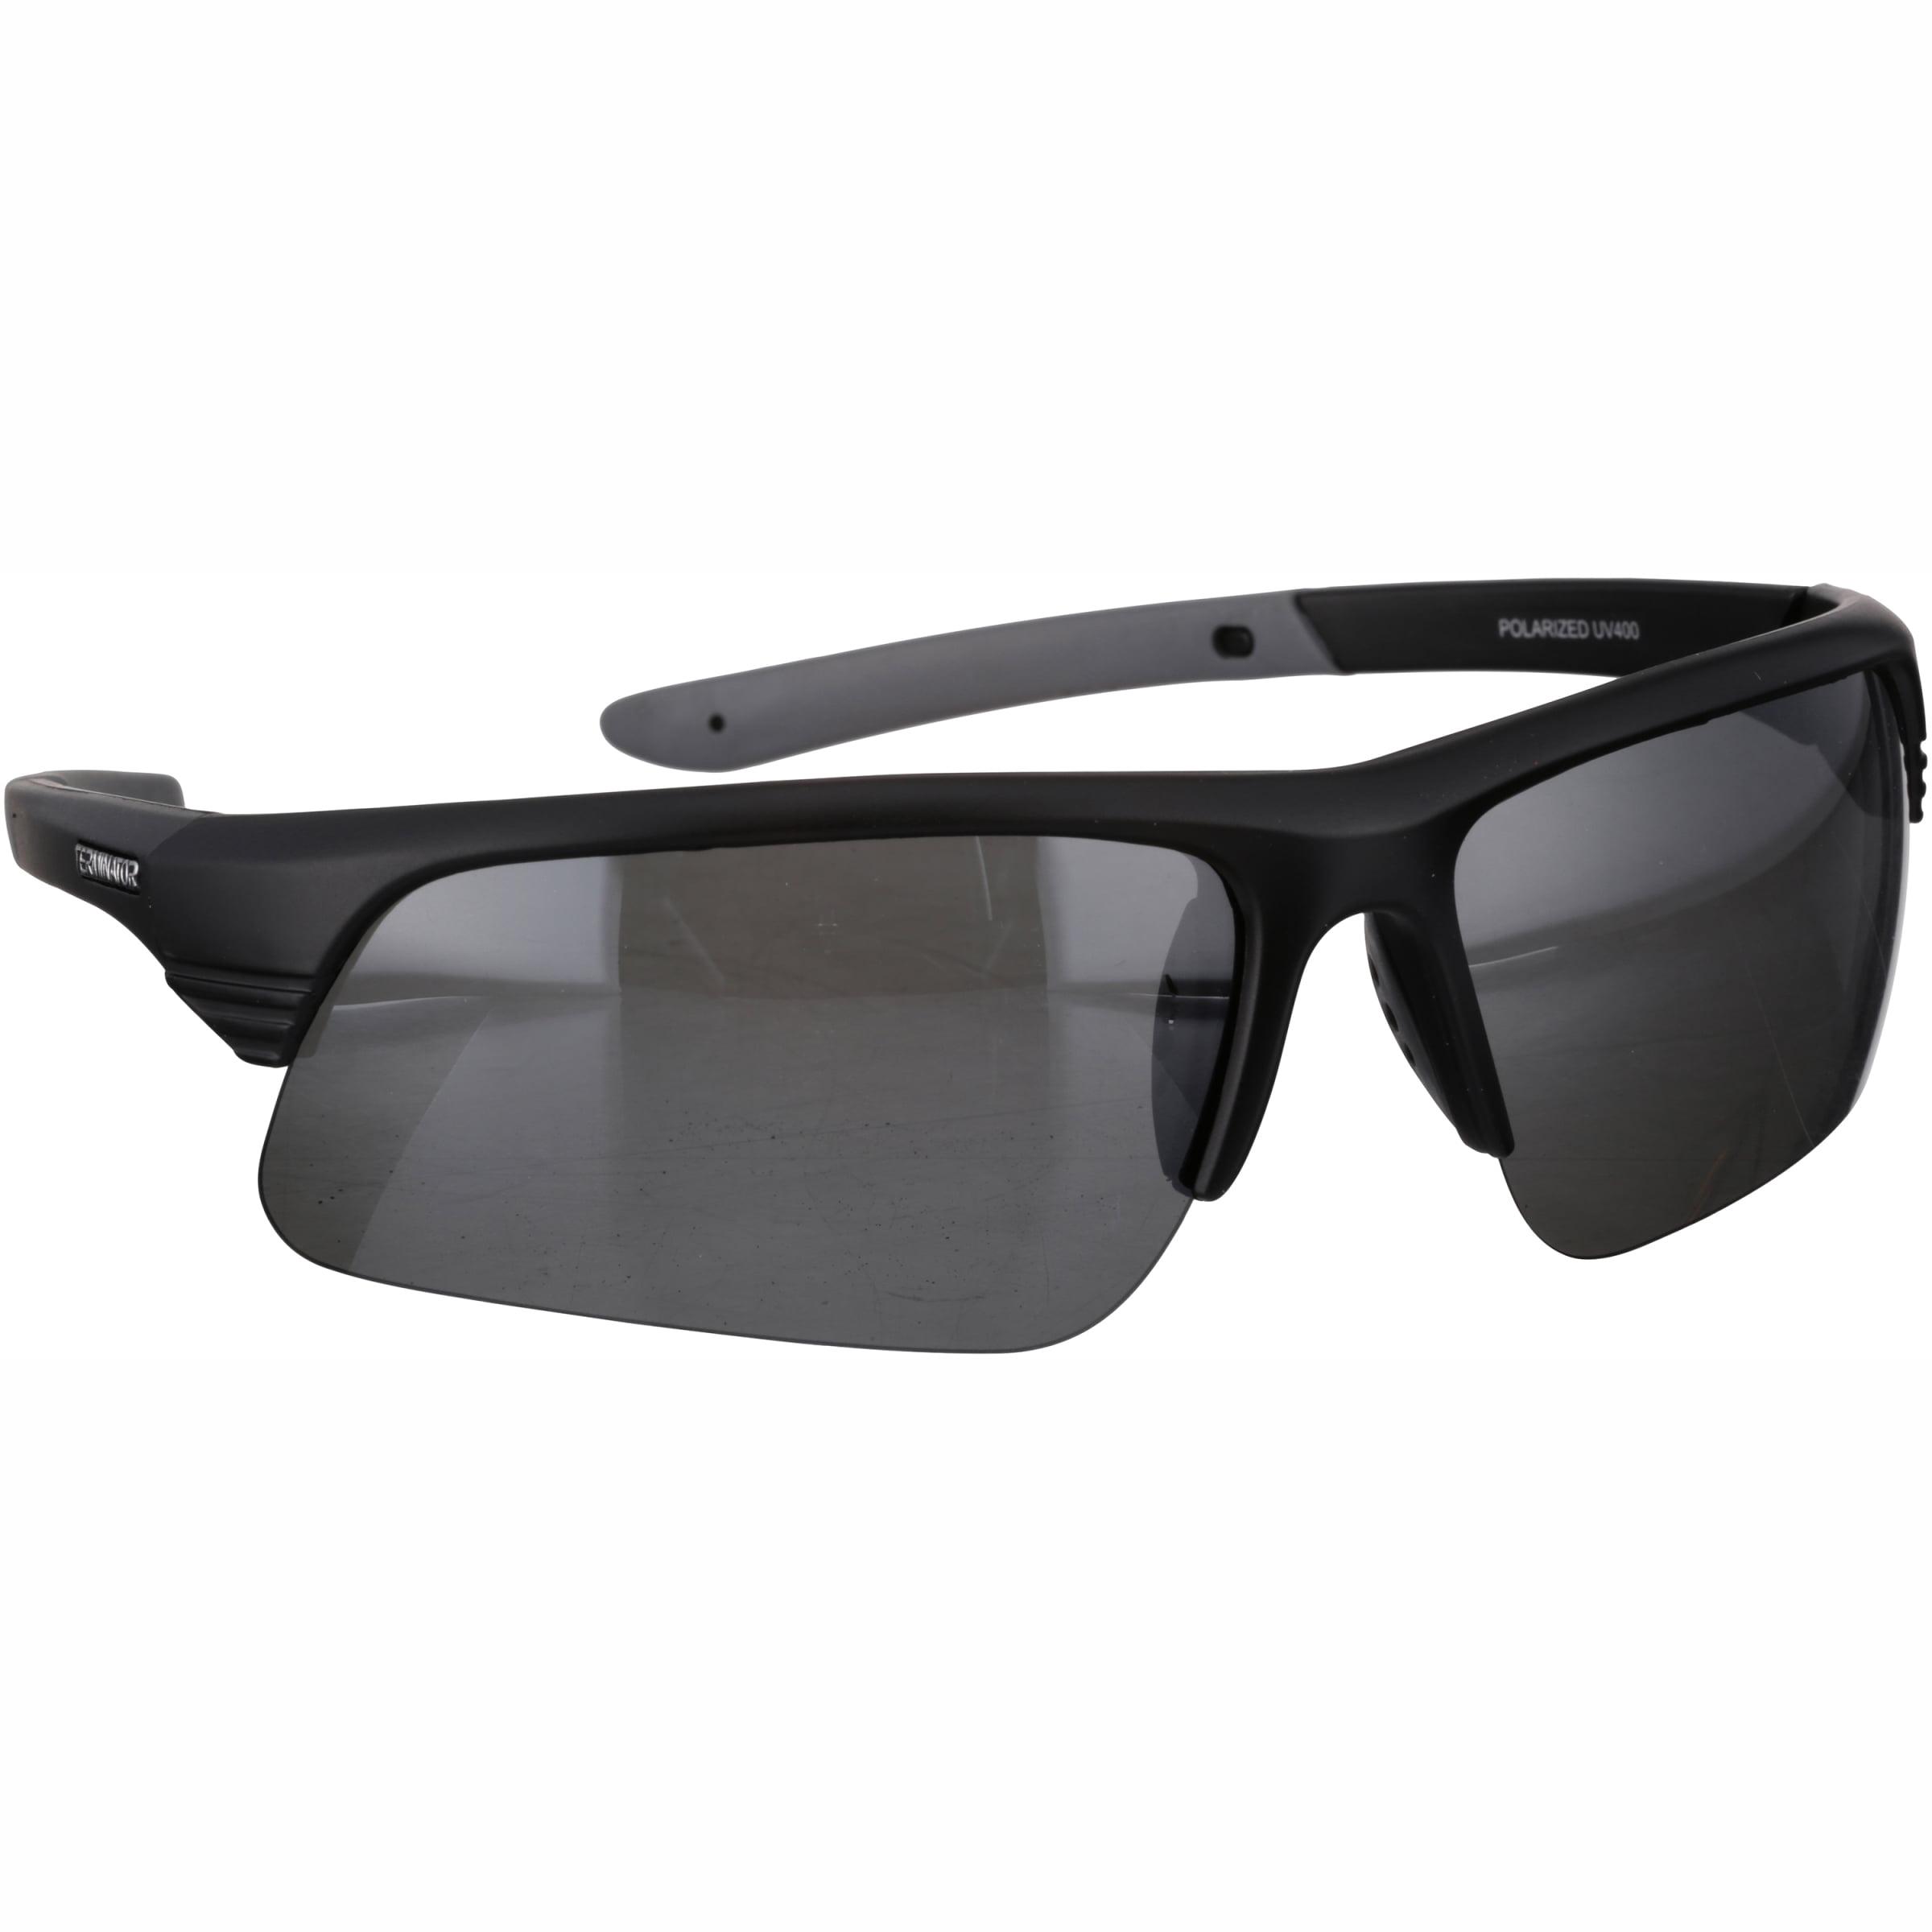 6d677bdf942b Terminator® Polarized High Performance Fishing Glasses - Walmart.com